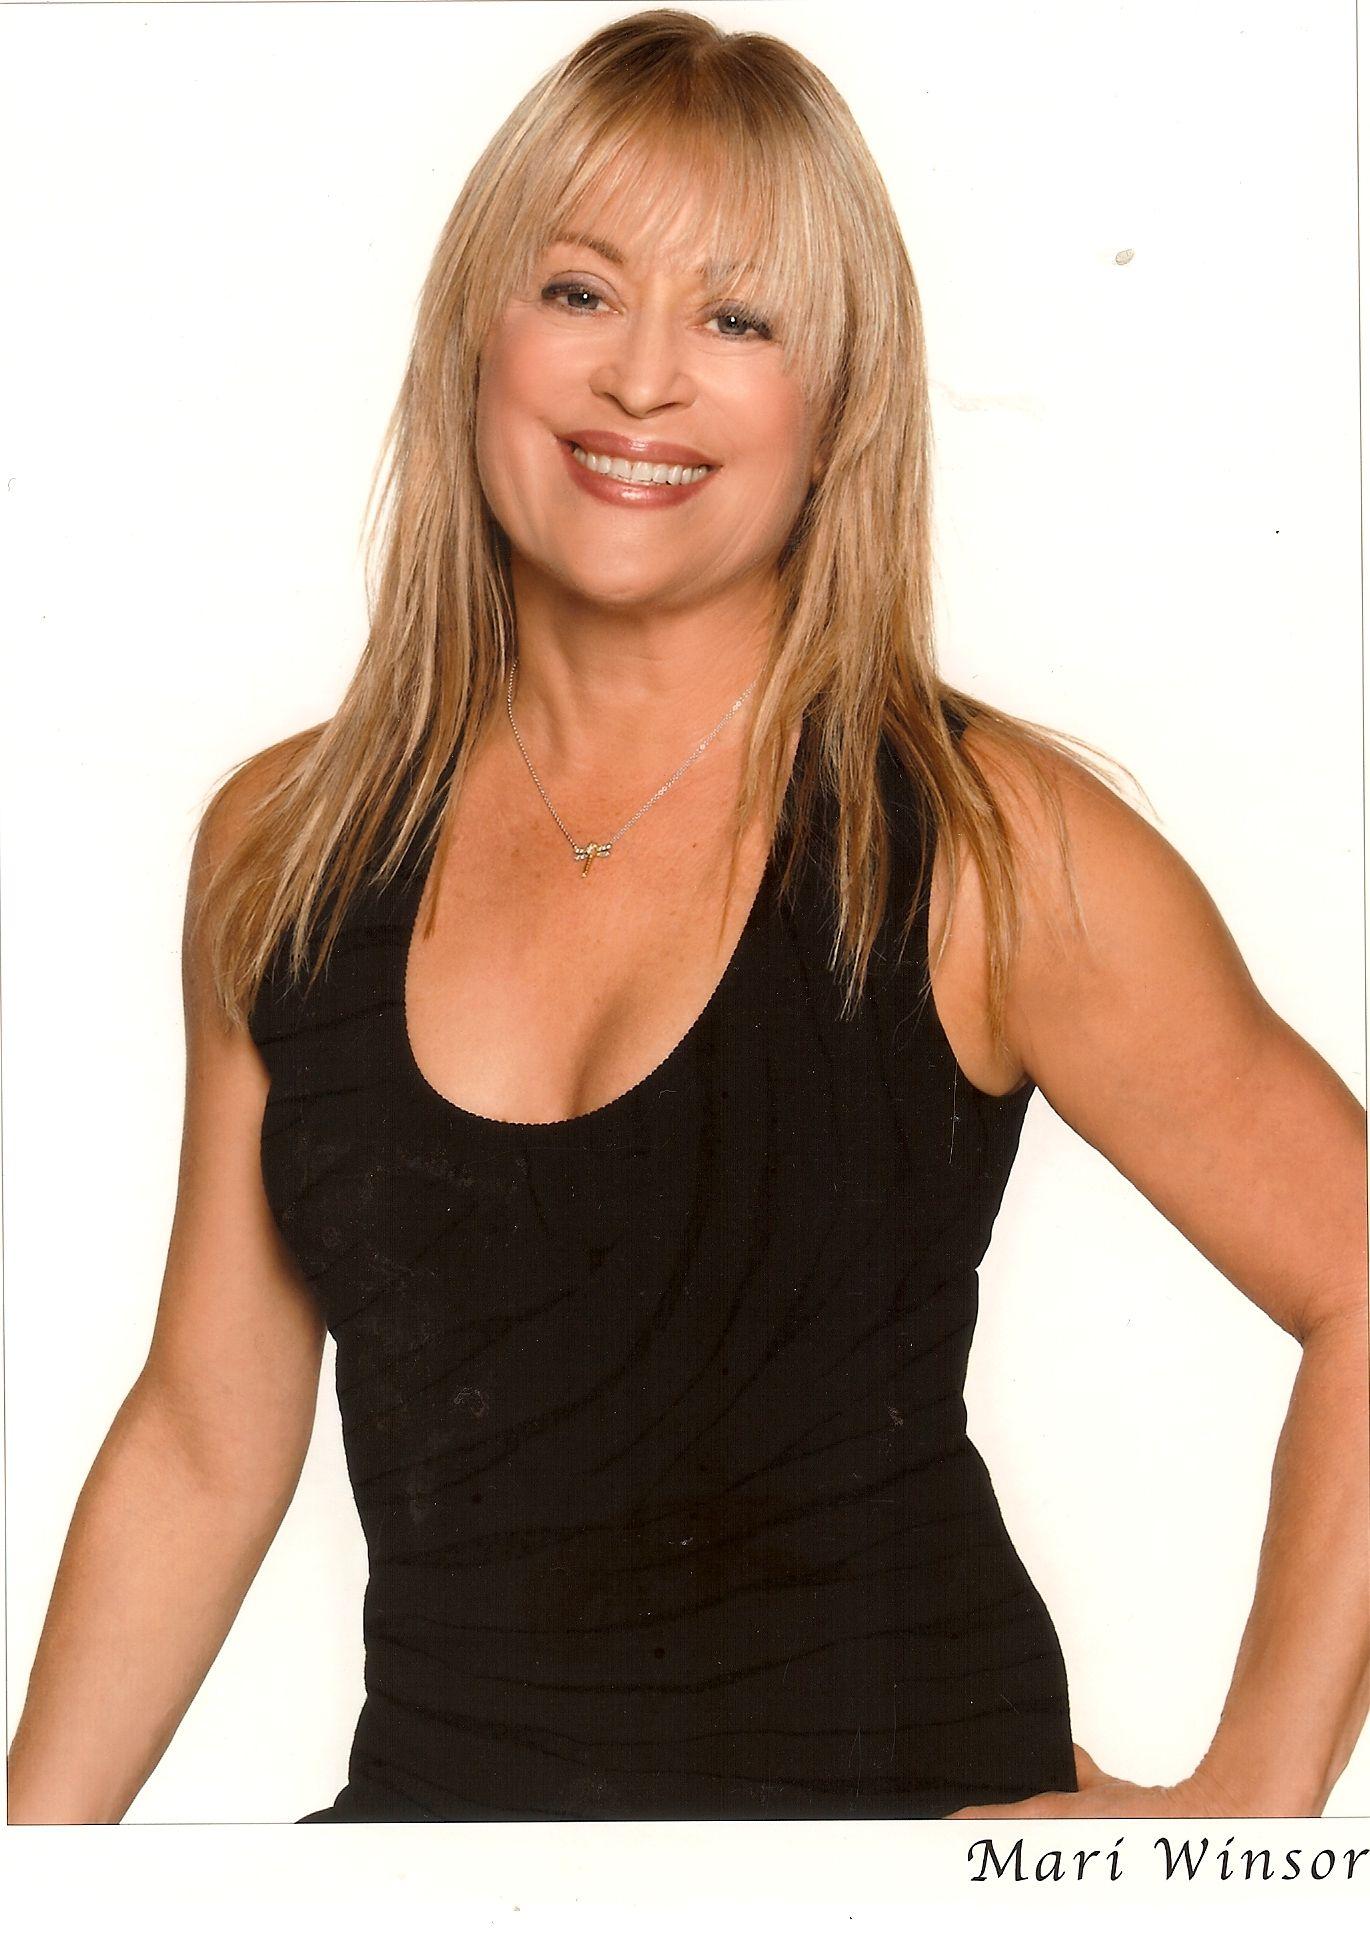 Mari Winsor on Staying Fit Over 40 | Mari Winsor - Winsor Pilates